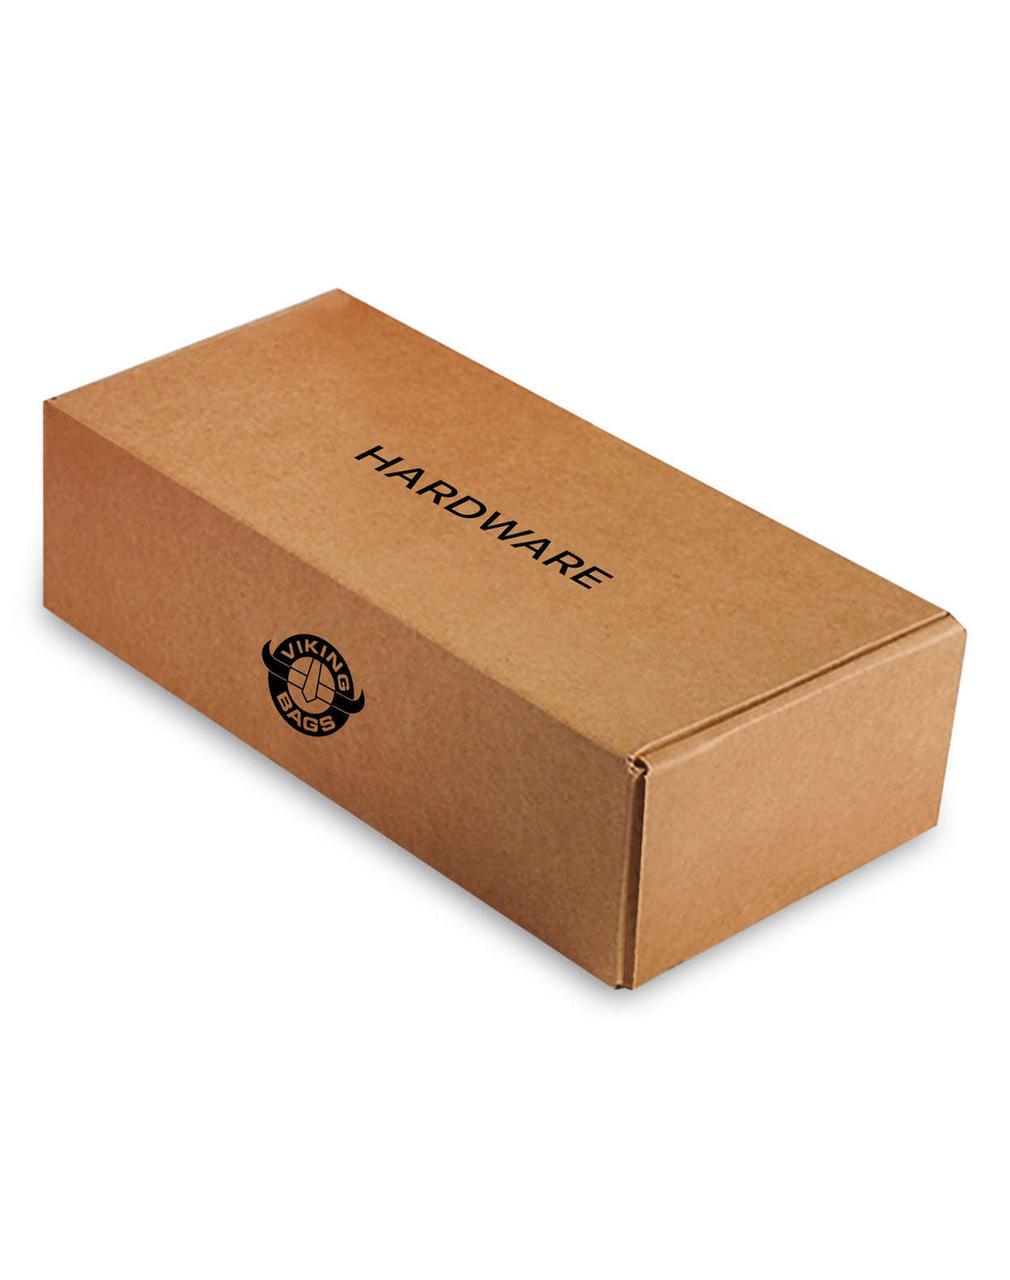 Honda 1500 Valkyrie Interstate Slanted Large Motorcycle Saddlebags Hardware Box